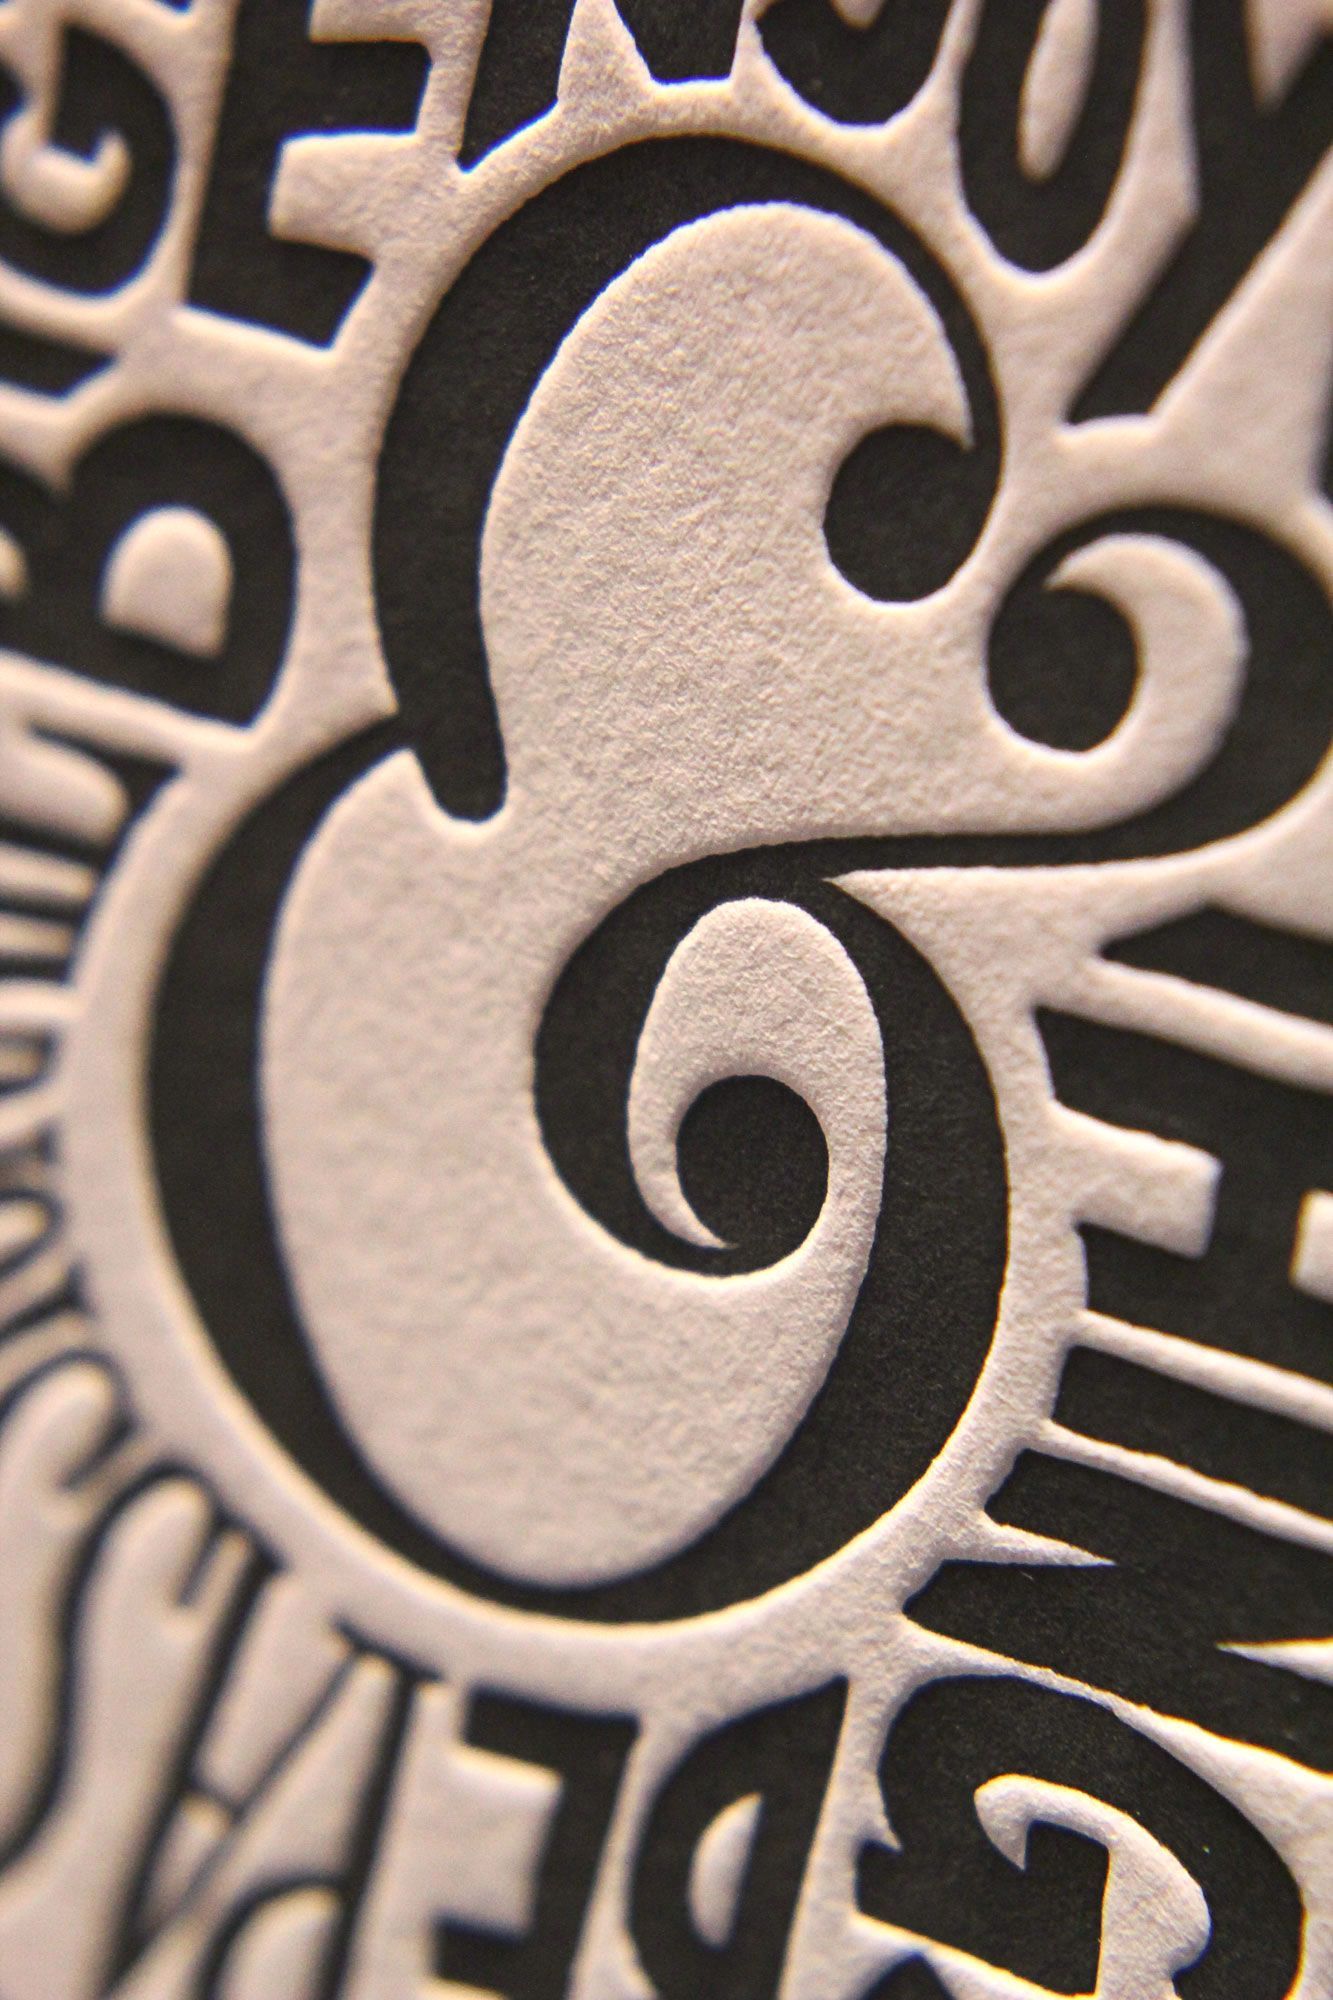 4677c5e09f3f Ampersand closeup via The Beauty of Letterpress